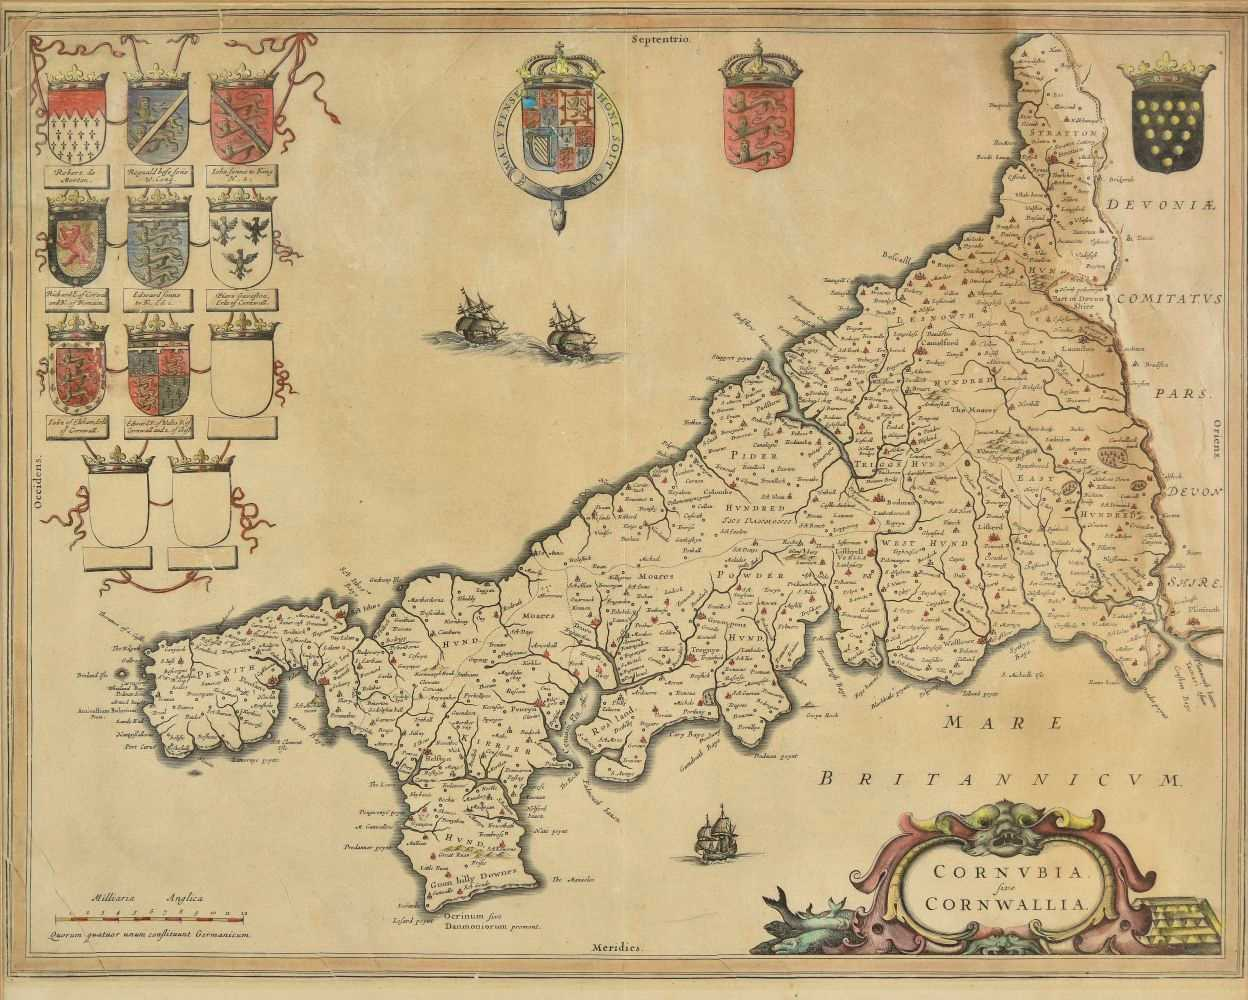 Lot 20-Cornwall. Blaeu (Johannes), Cornubia sive Cornwallia, Amsterdam, circa 1650